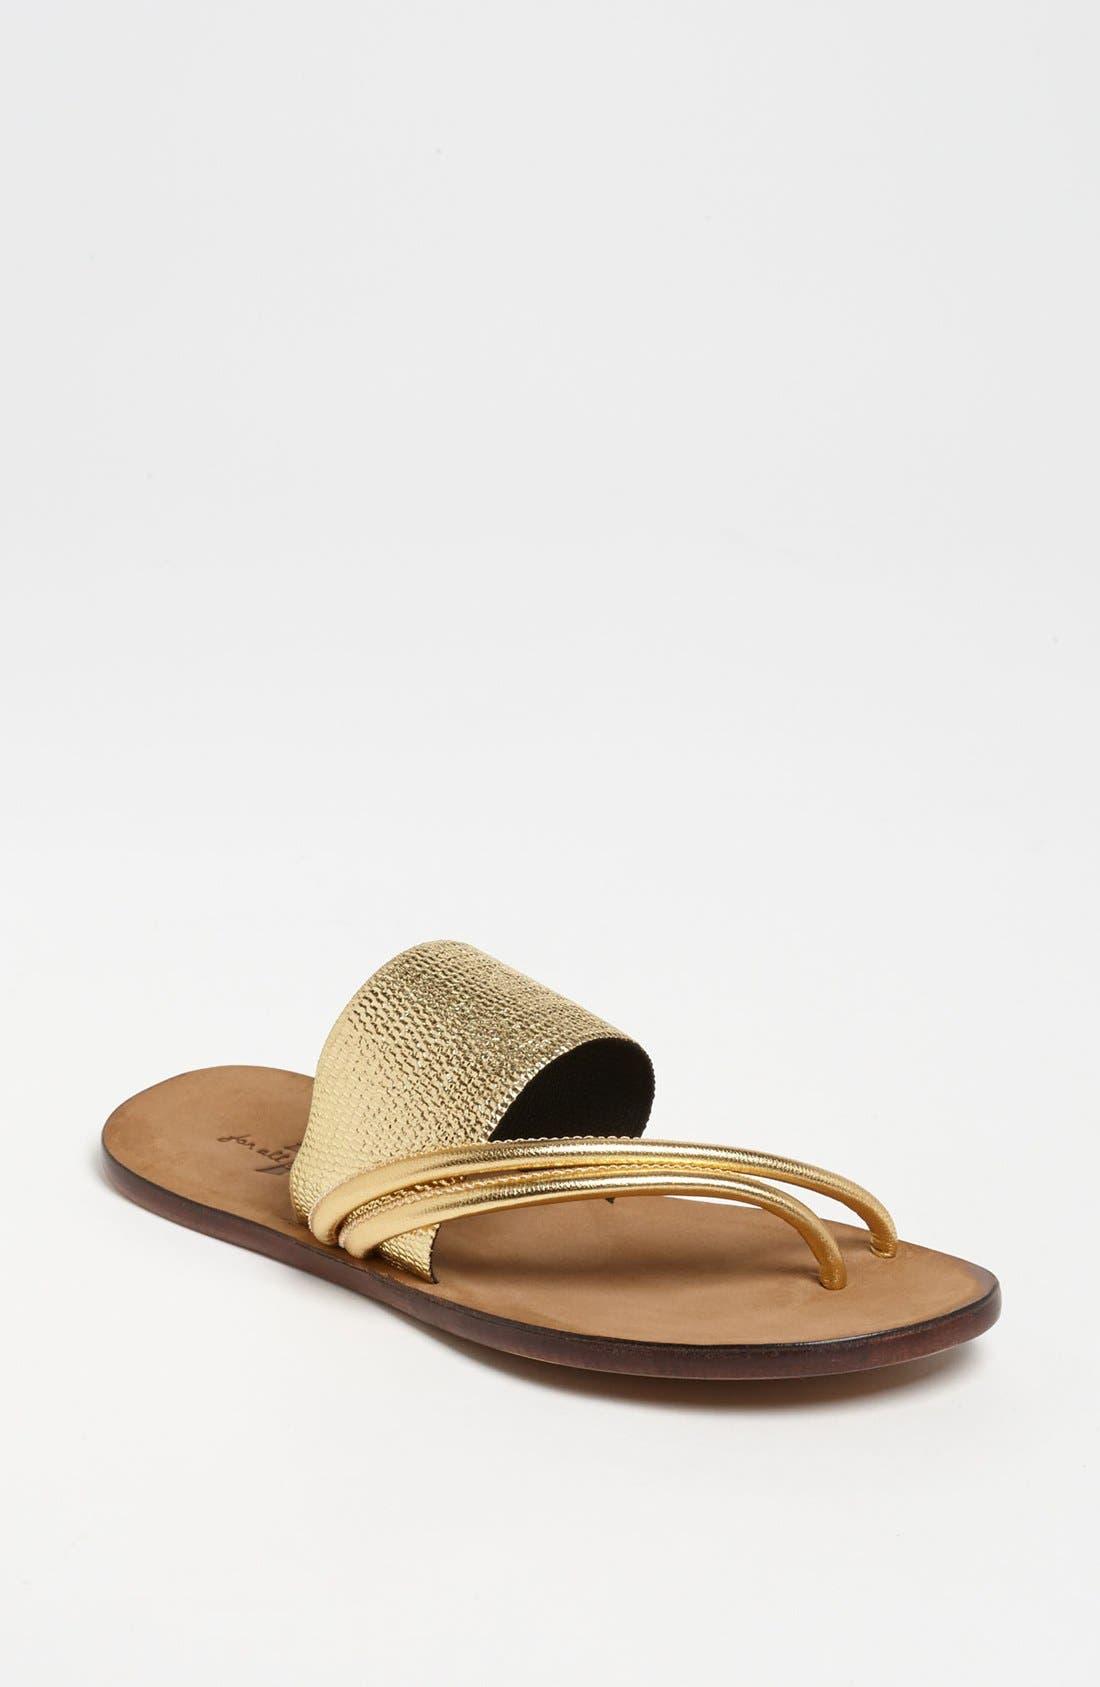 Alternate Image 1 Selected - 7 For All Mankind® 'Zaira' Sandal (Online Only)